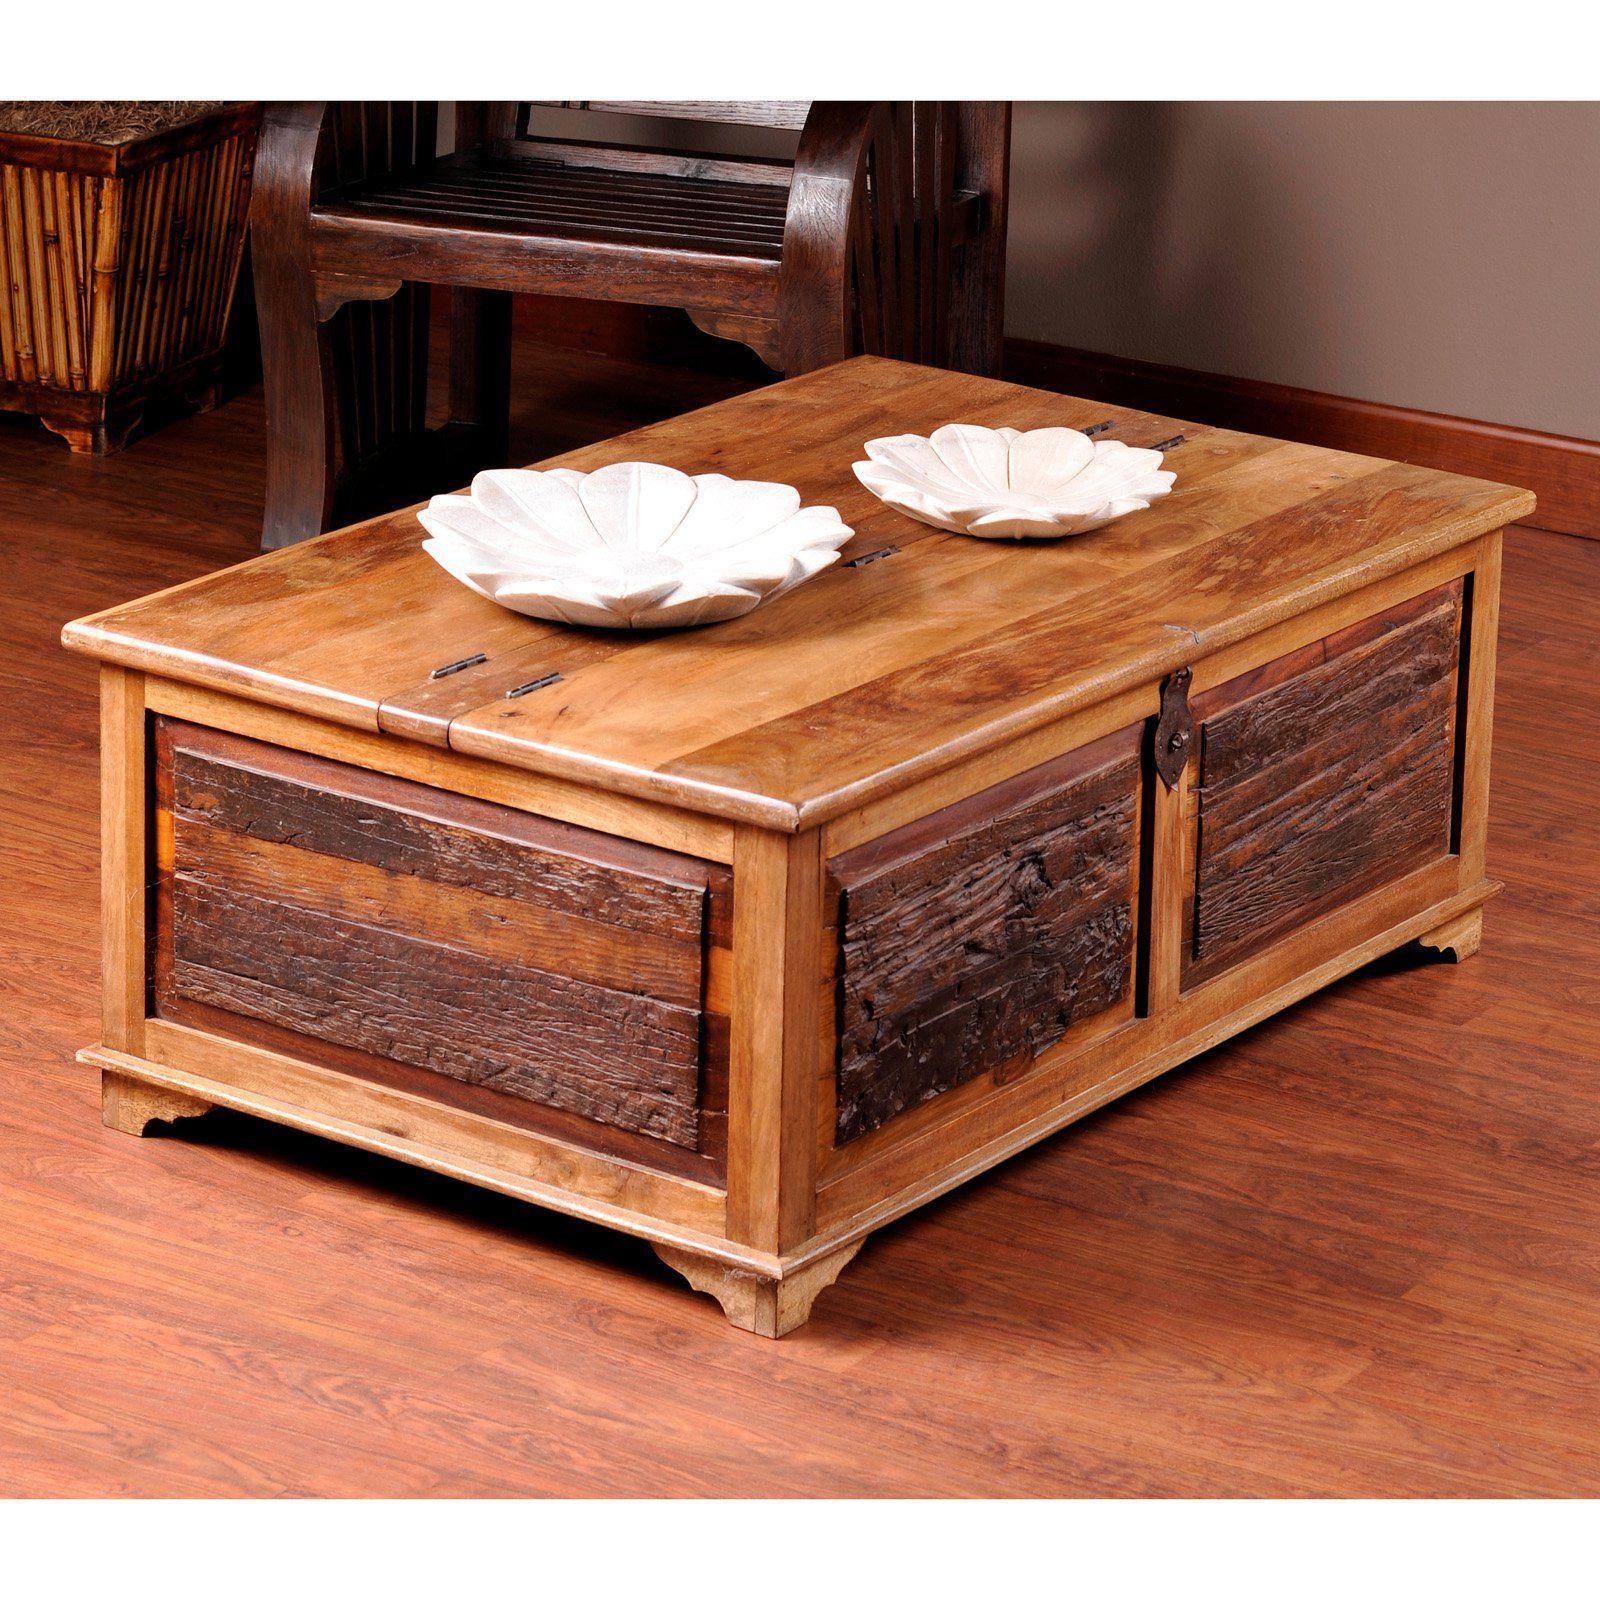 William Sheppee Kerala Lift Top Coffee Table Coffee Table Blanket Box Coffee Table Coffee Table Wayfair [ 1600 x 1600 Pixel ]